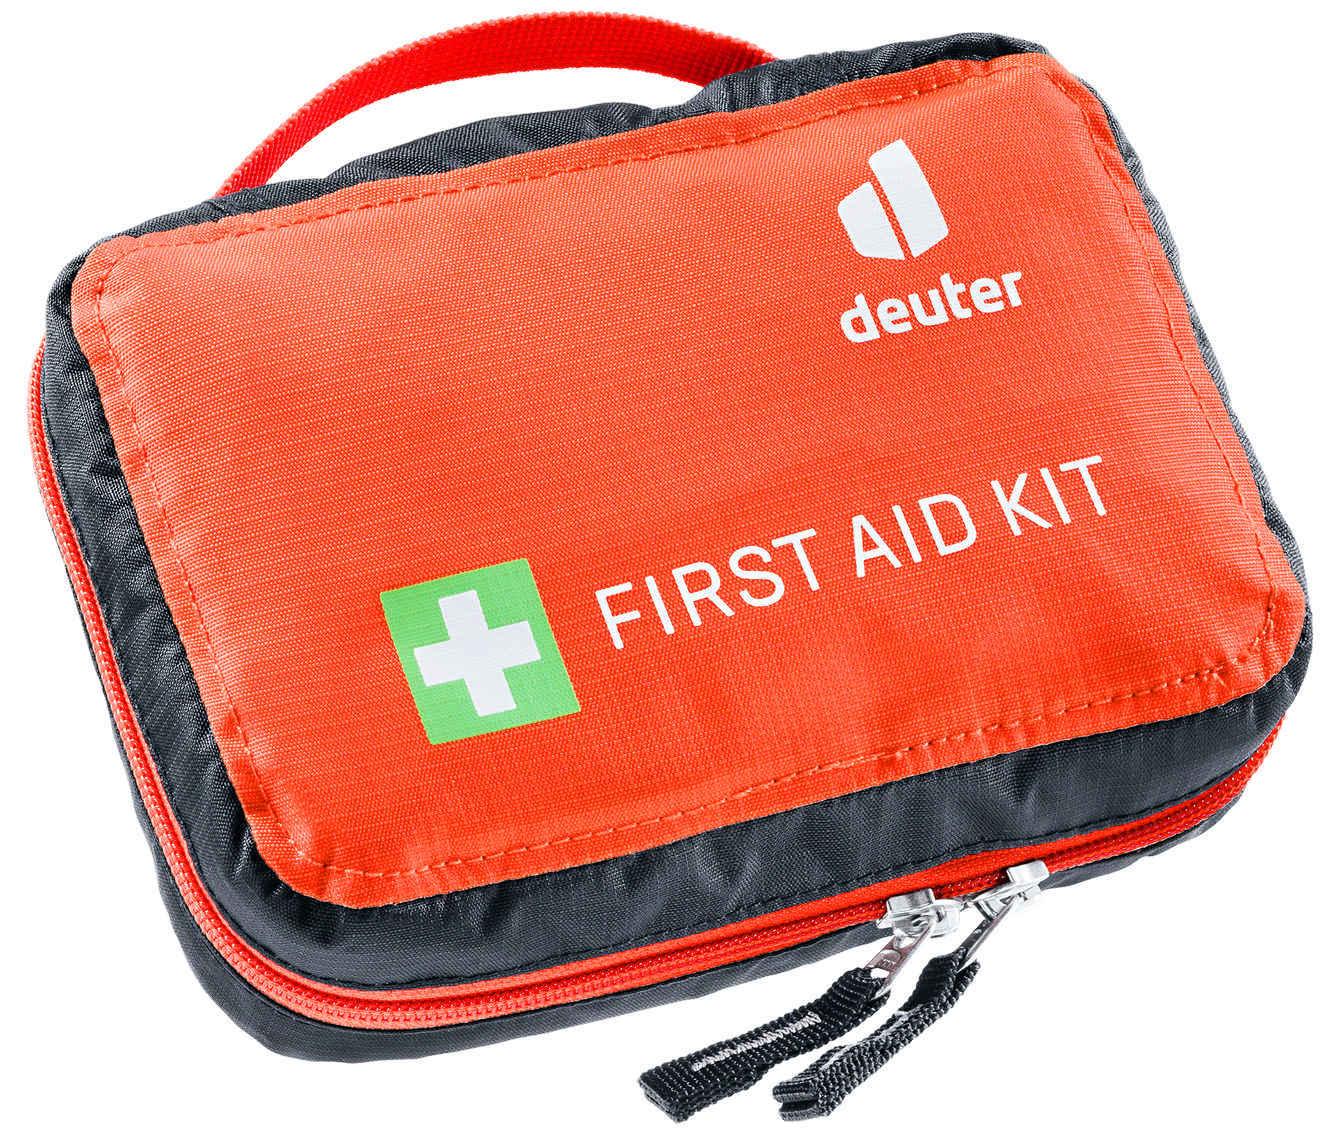 Аптечки Аптечка туристическая Deuter First Aid Kit (без наполнения) (2021) 3970121-9002-FirstAidKitRegular-s21-d0.jpg